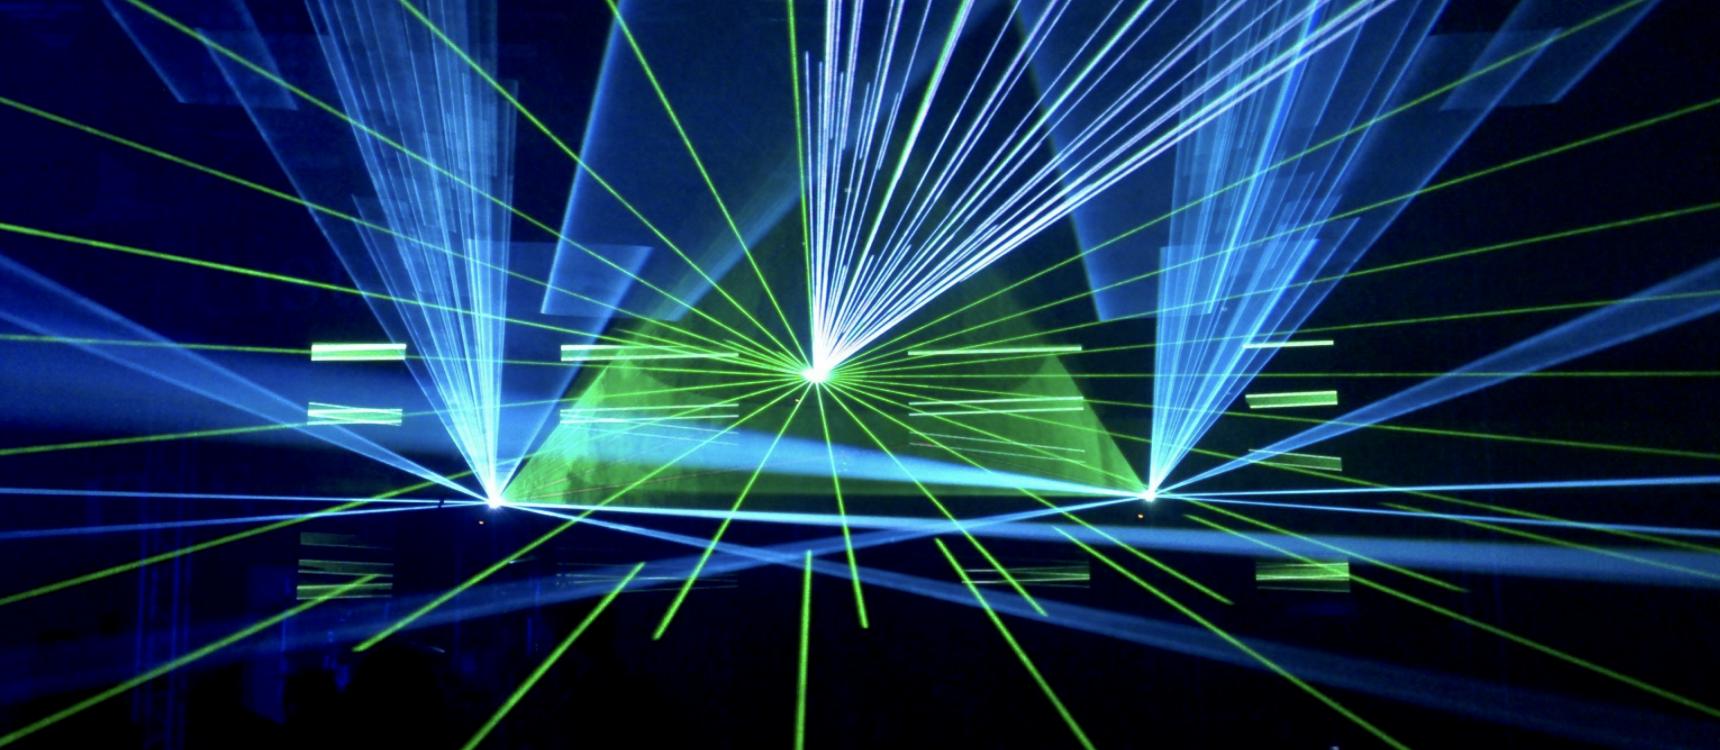 lasershow_01.jpg